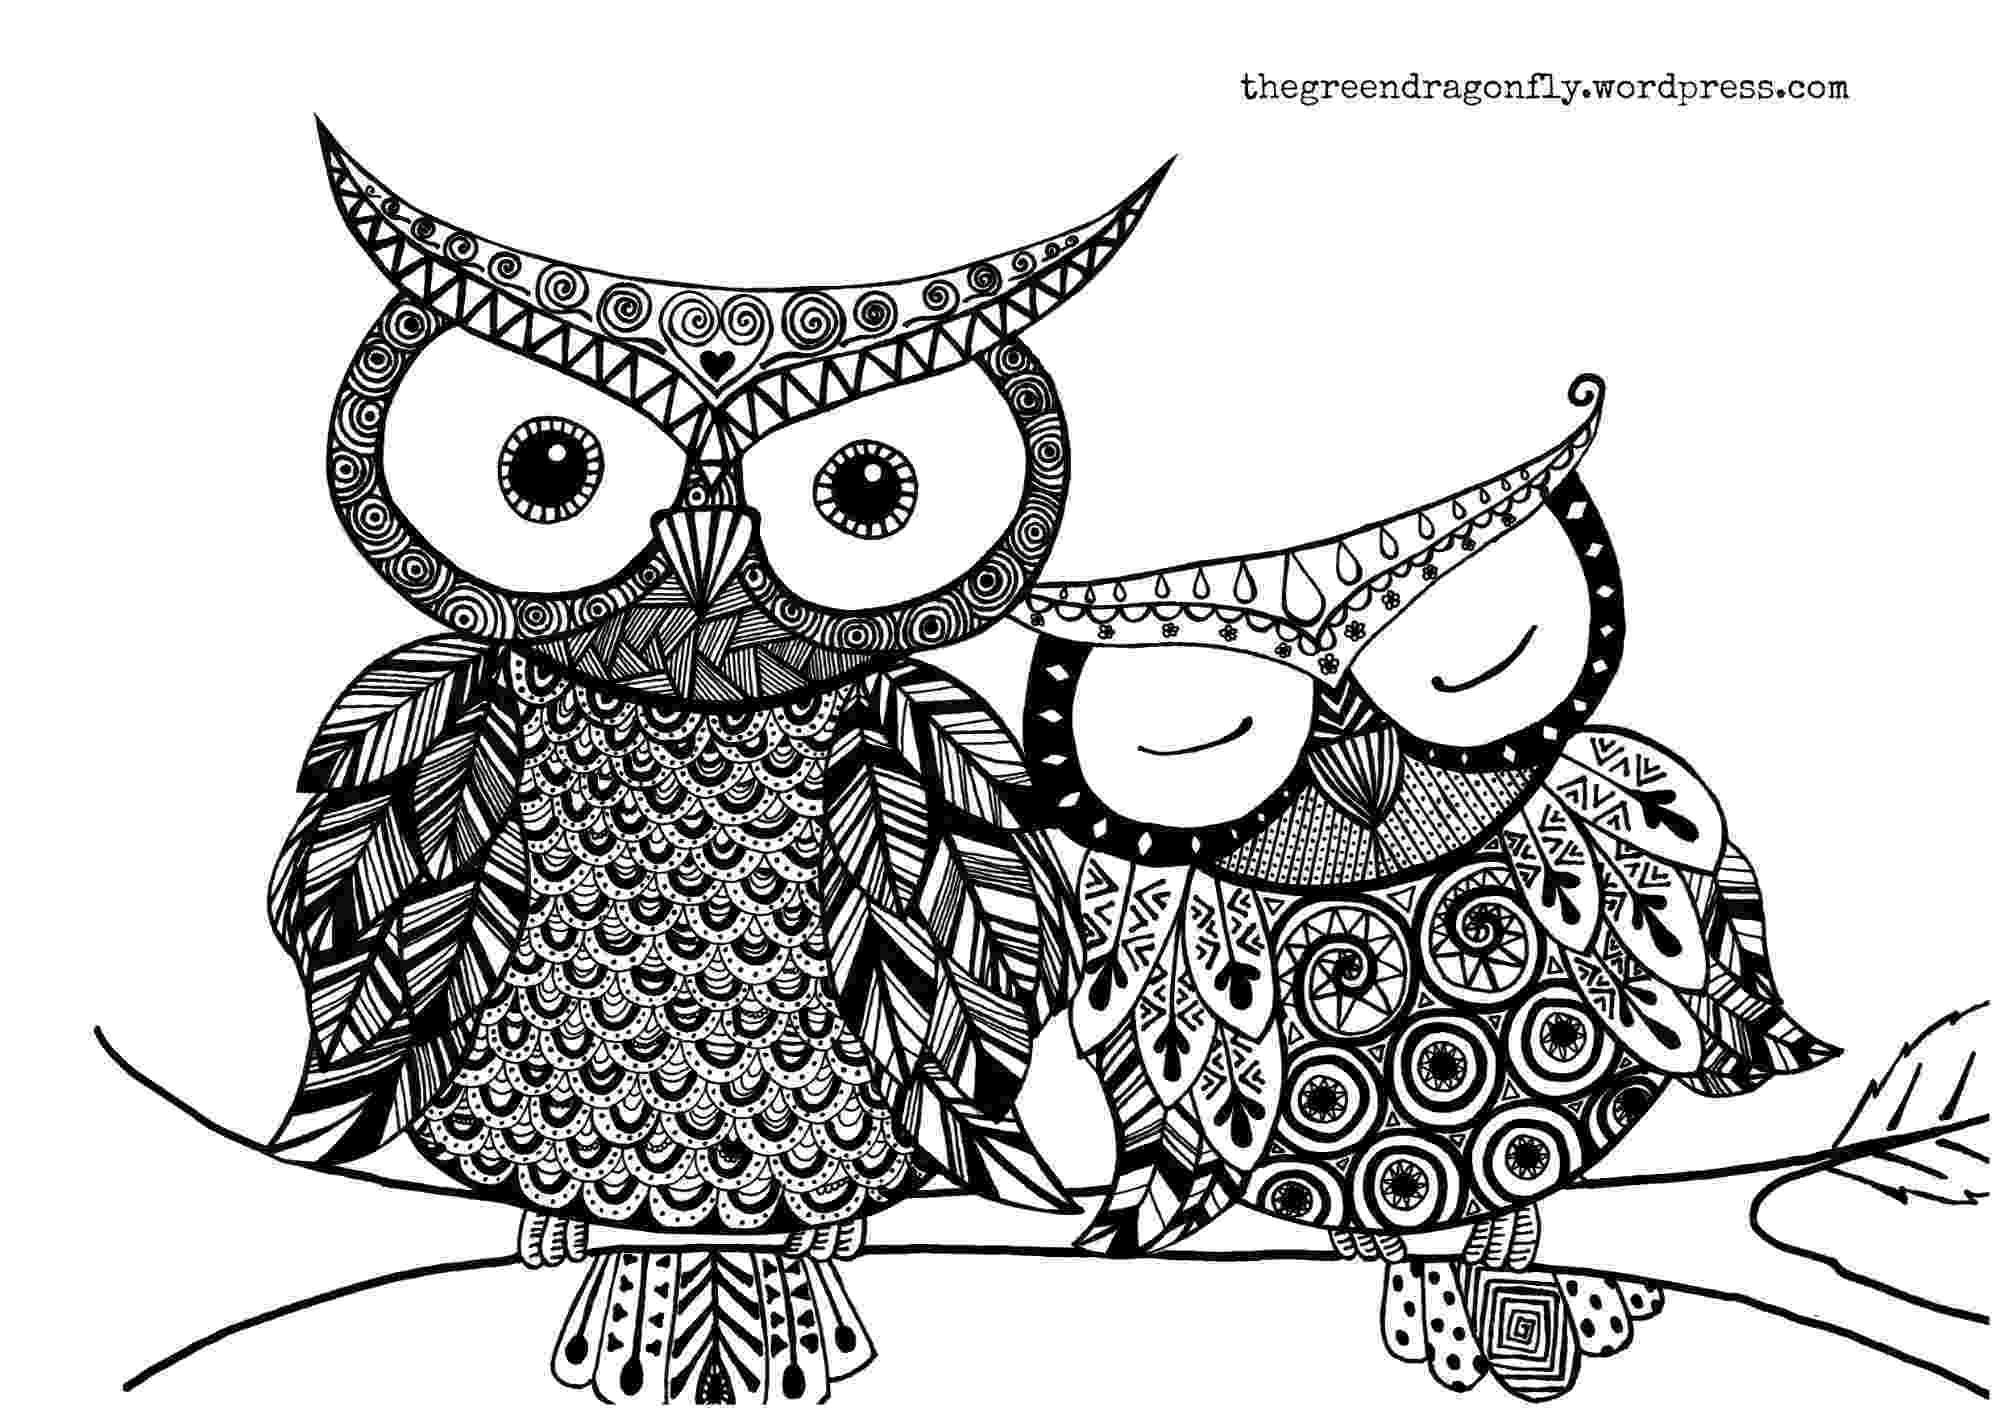 animal mandala animal mandala coloring pages to download and print for free mandala animal 1 1